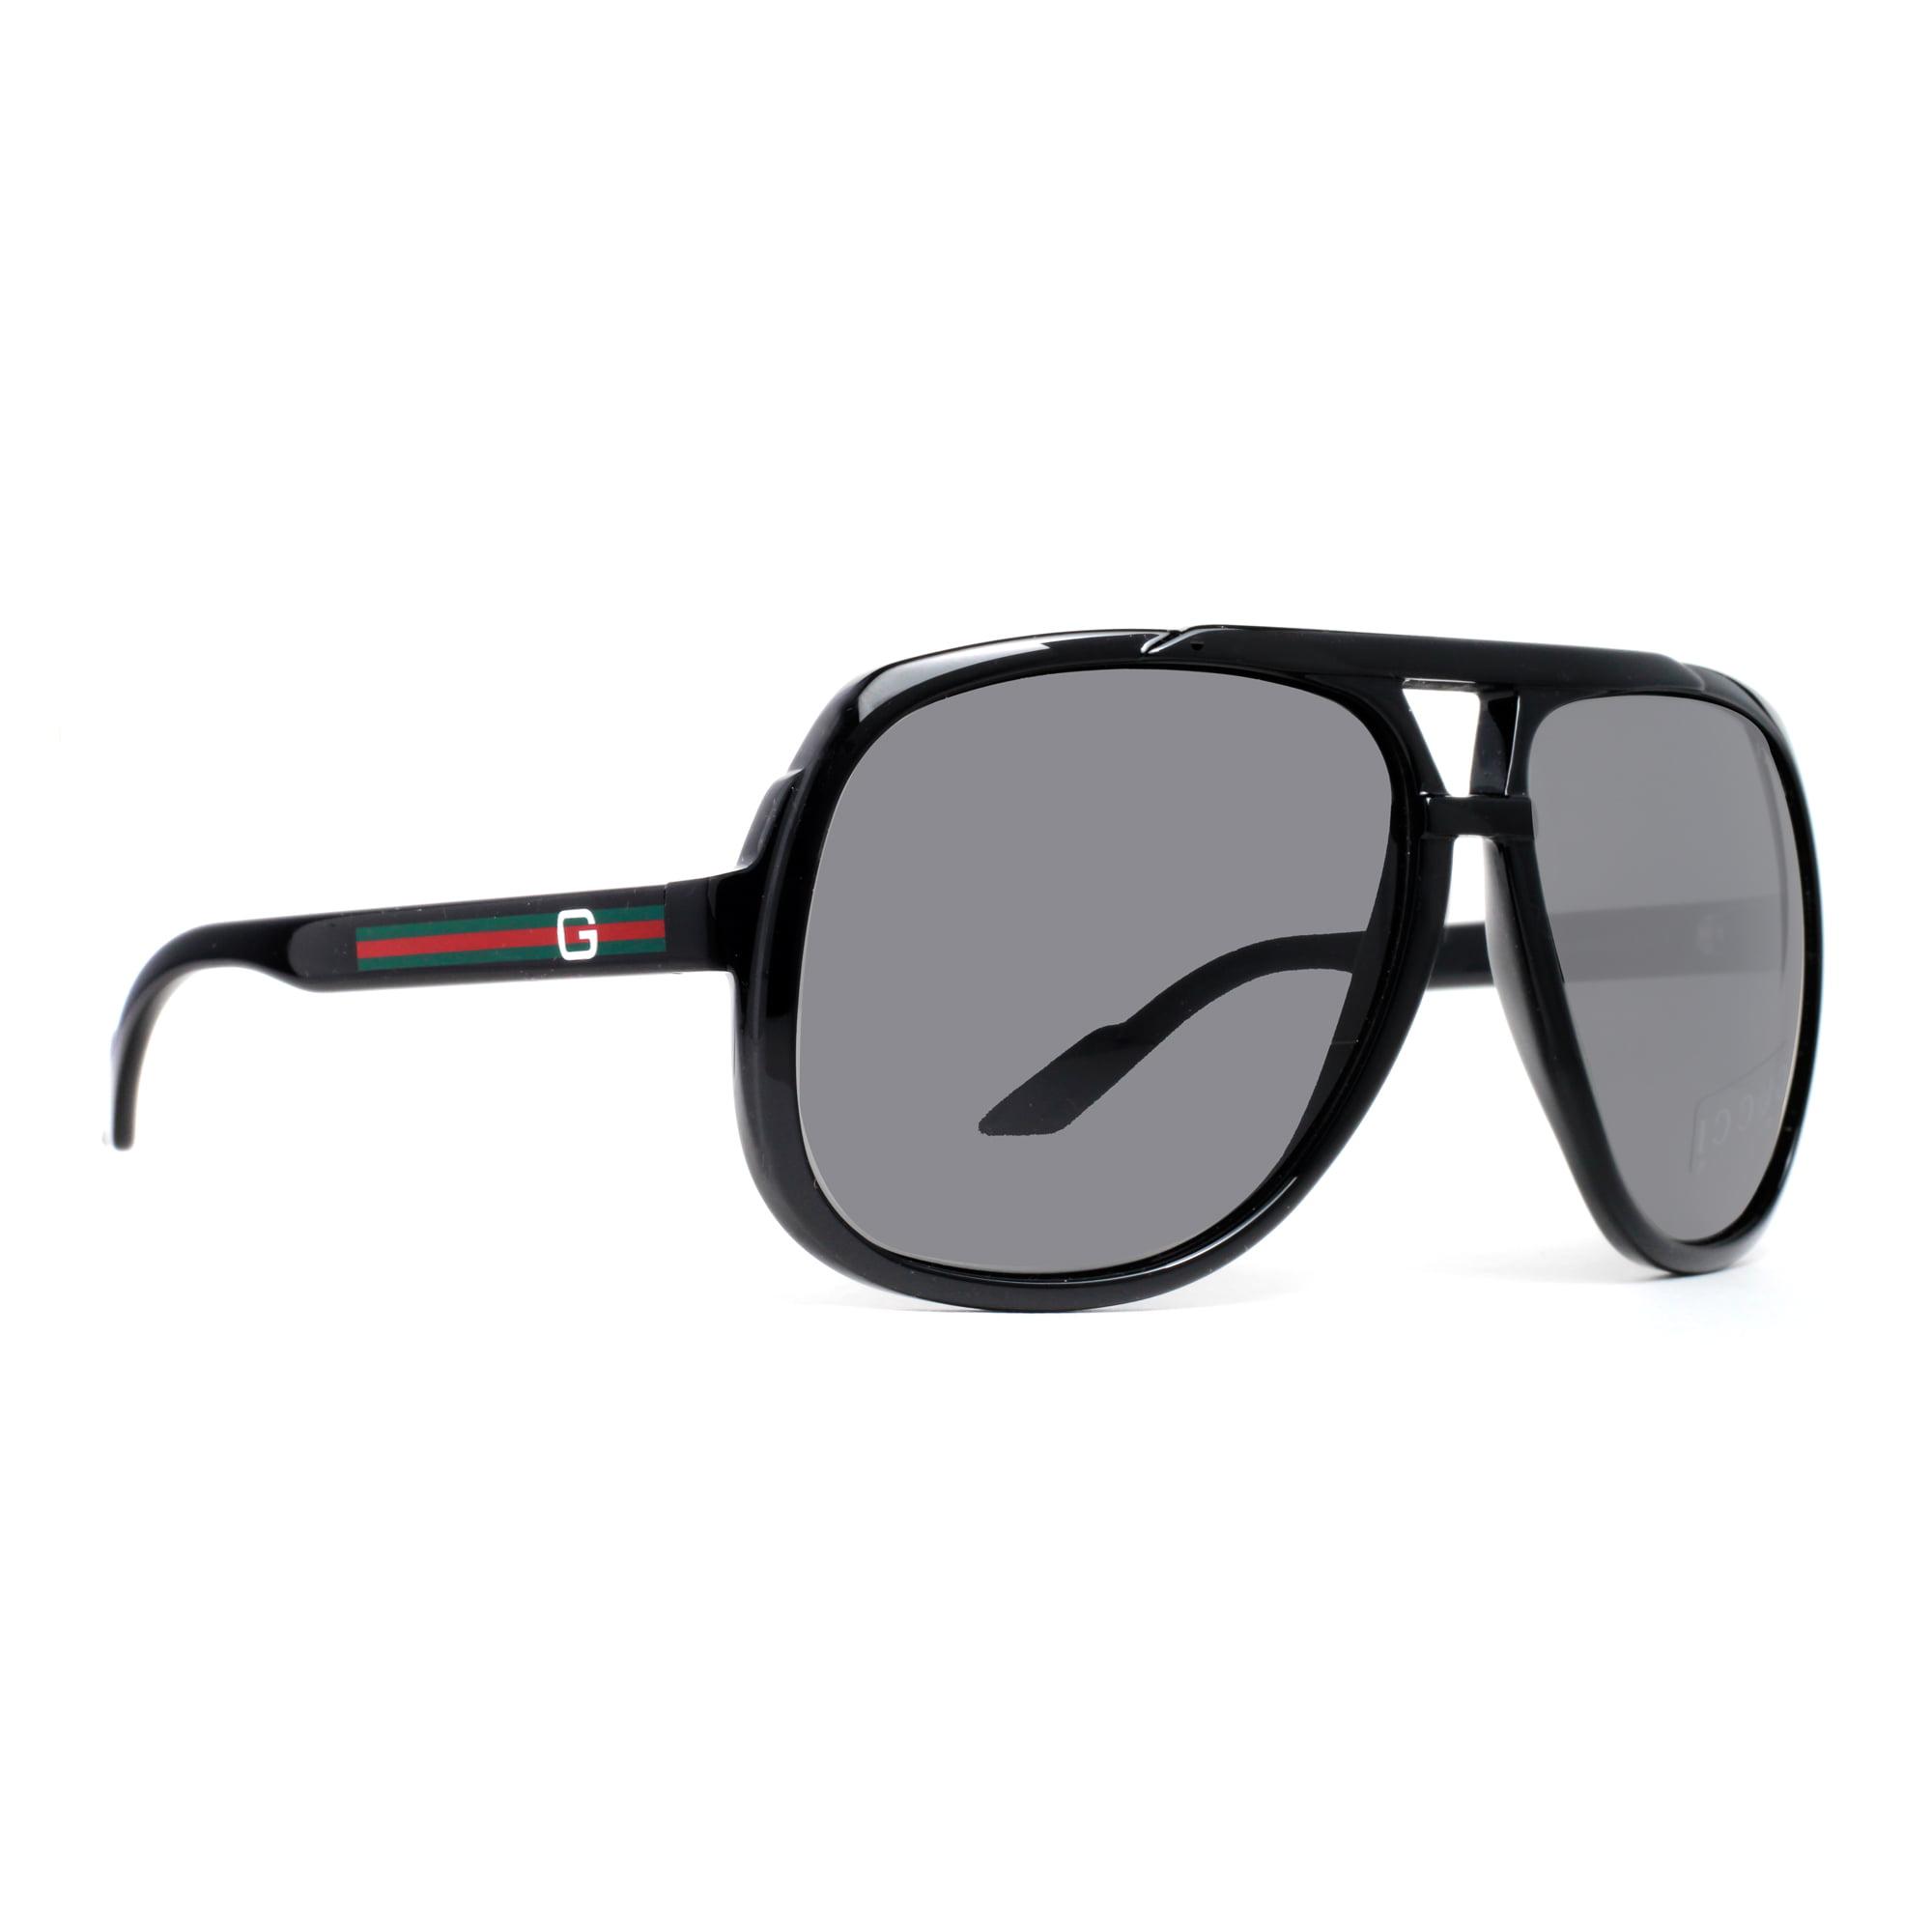 1ccd280d608 GUCCI - Gucci GG 1622 S D28 R6 Shiny Black Grey Square Aviator Sunglasses -  Walmart.com